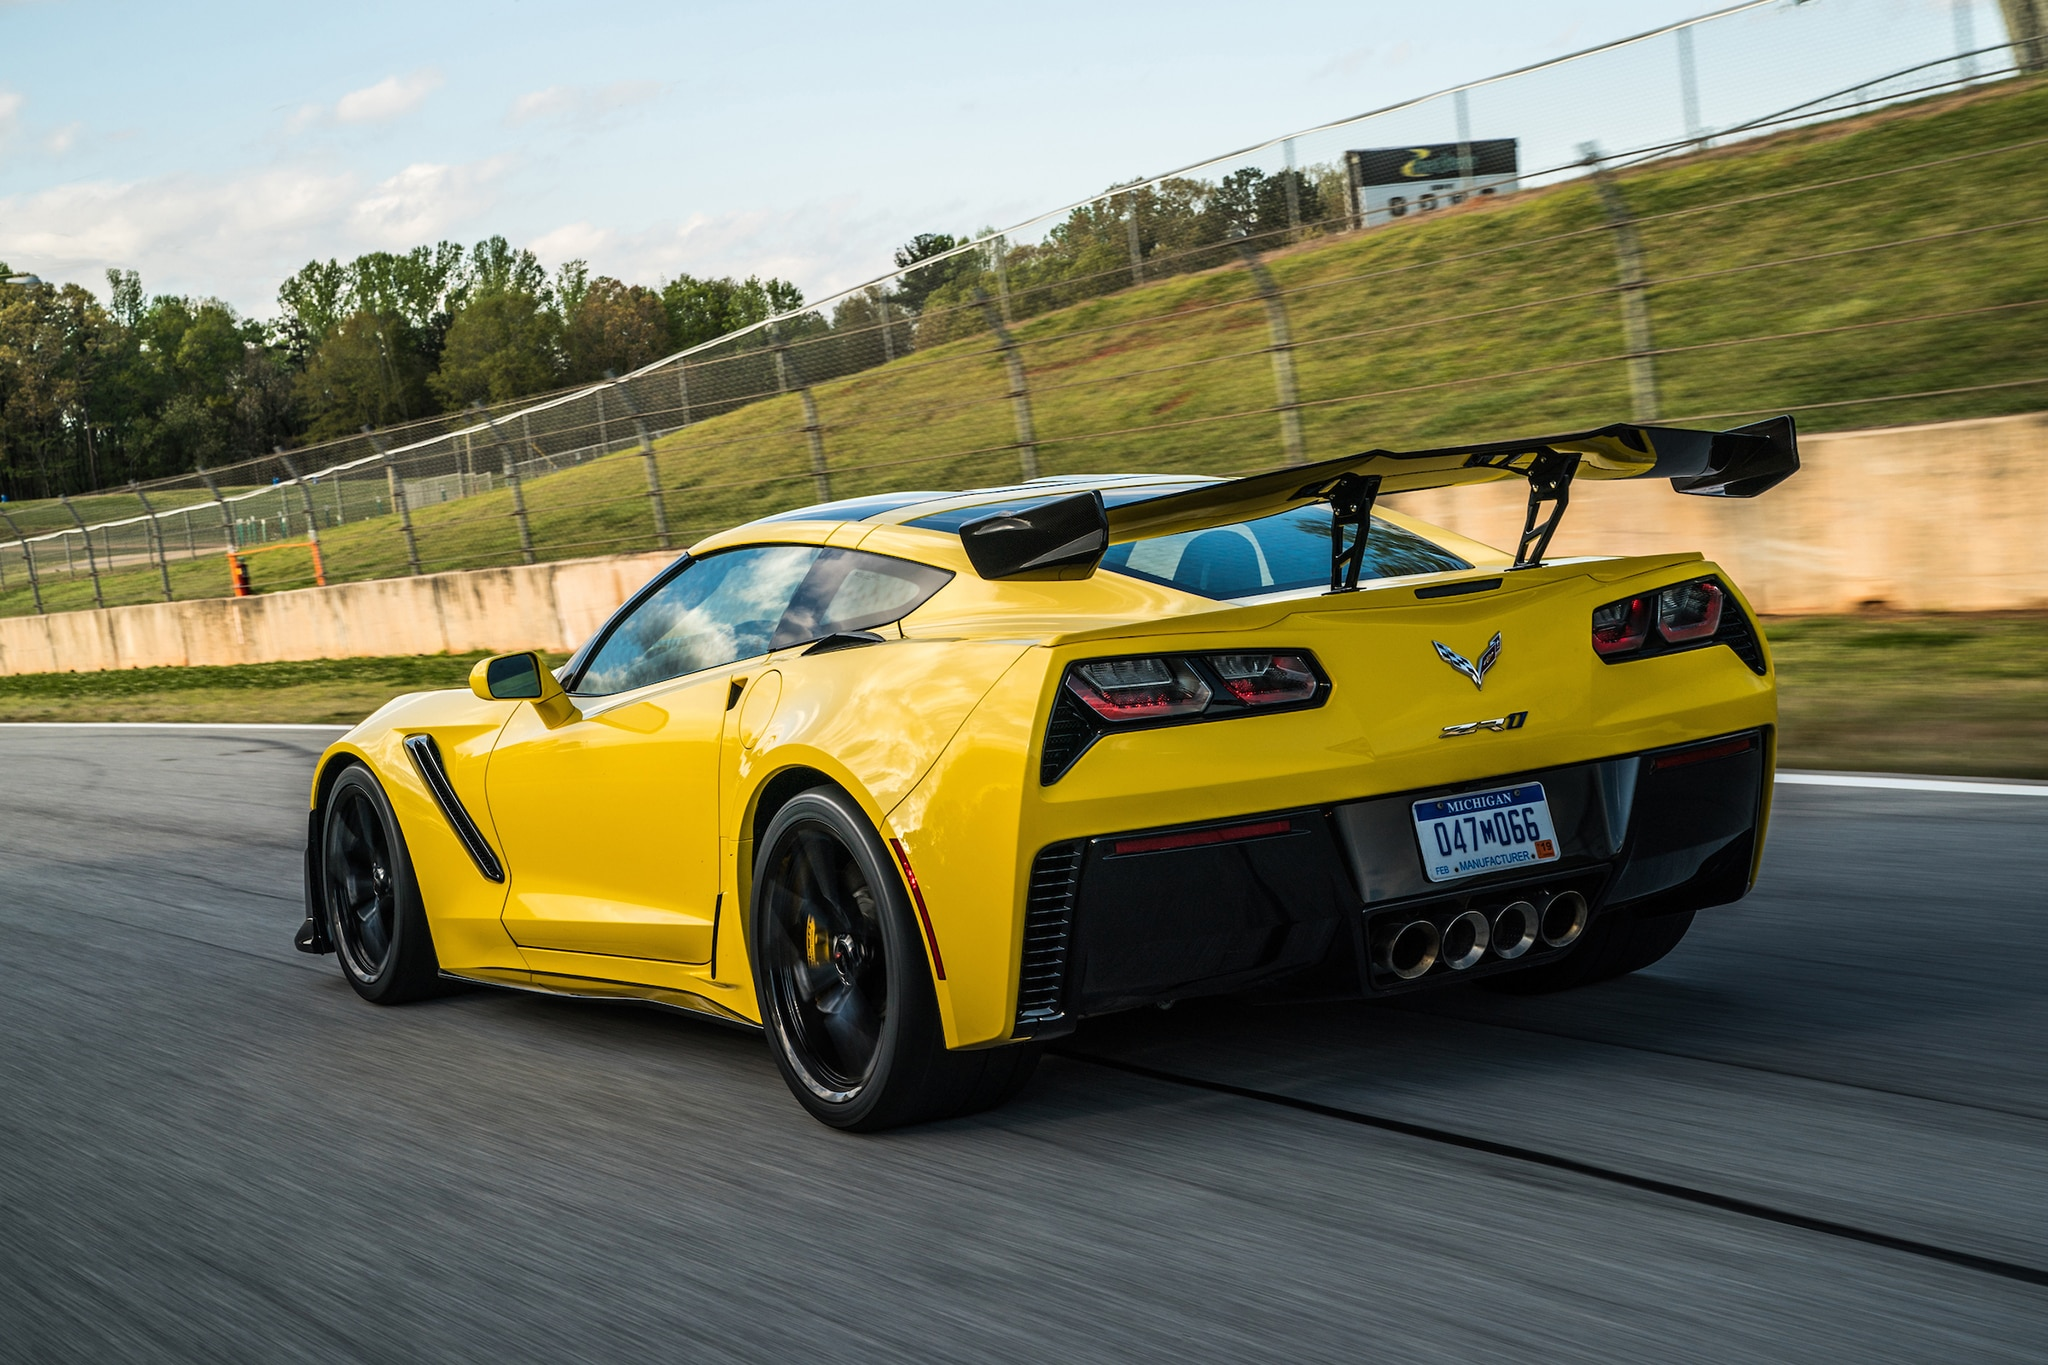 4 Door Corvette 2018 >> 2019 Chevrolet Corvette ZR1 First Drive   Automobile Magazine